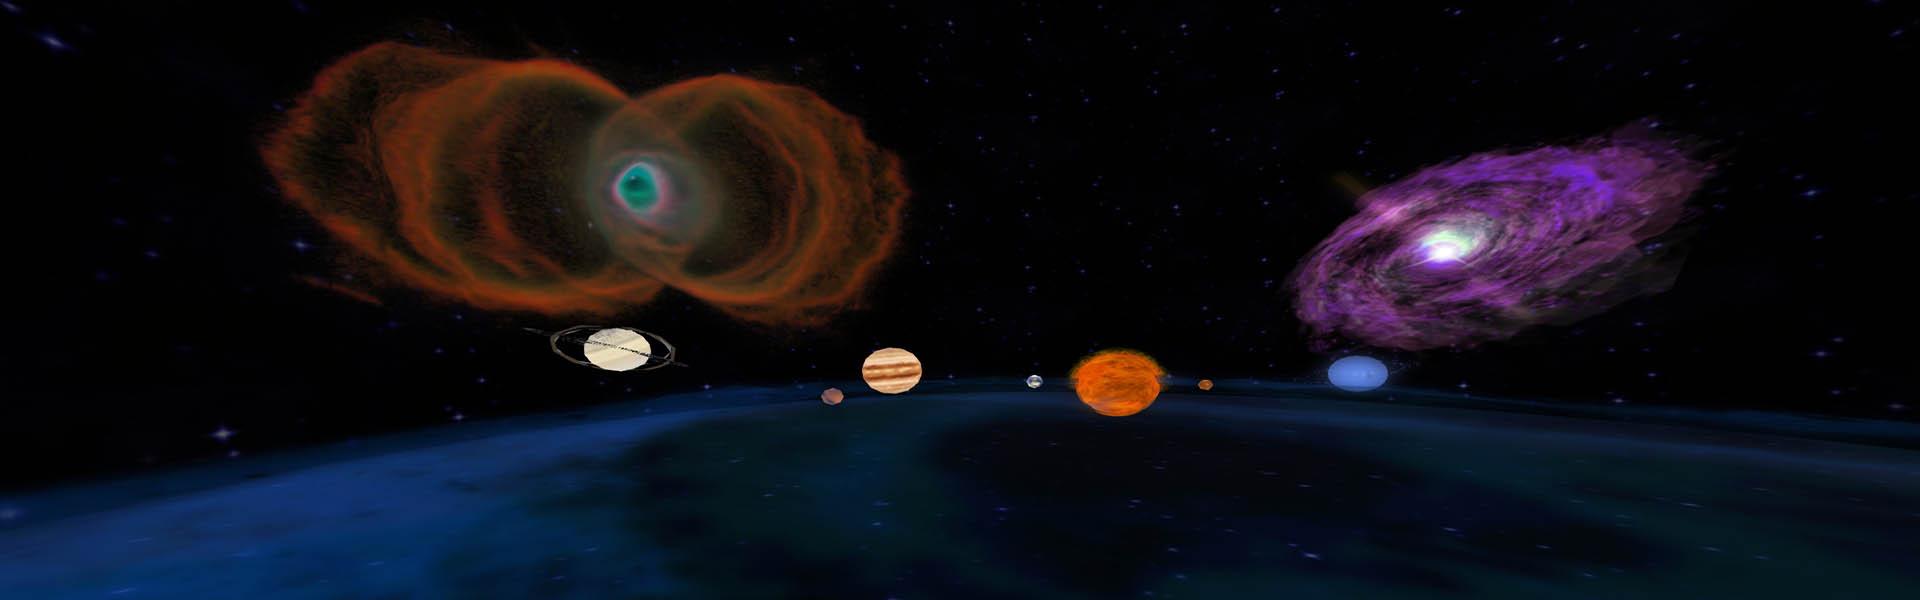 realidad-virtual-astronomia-3D